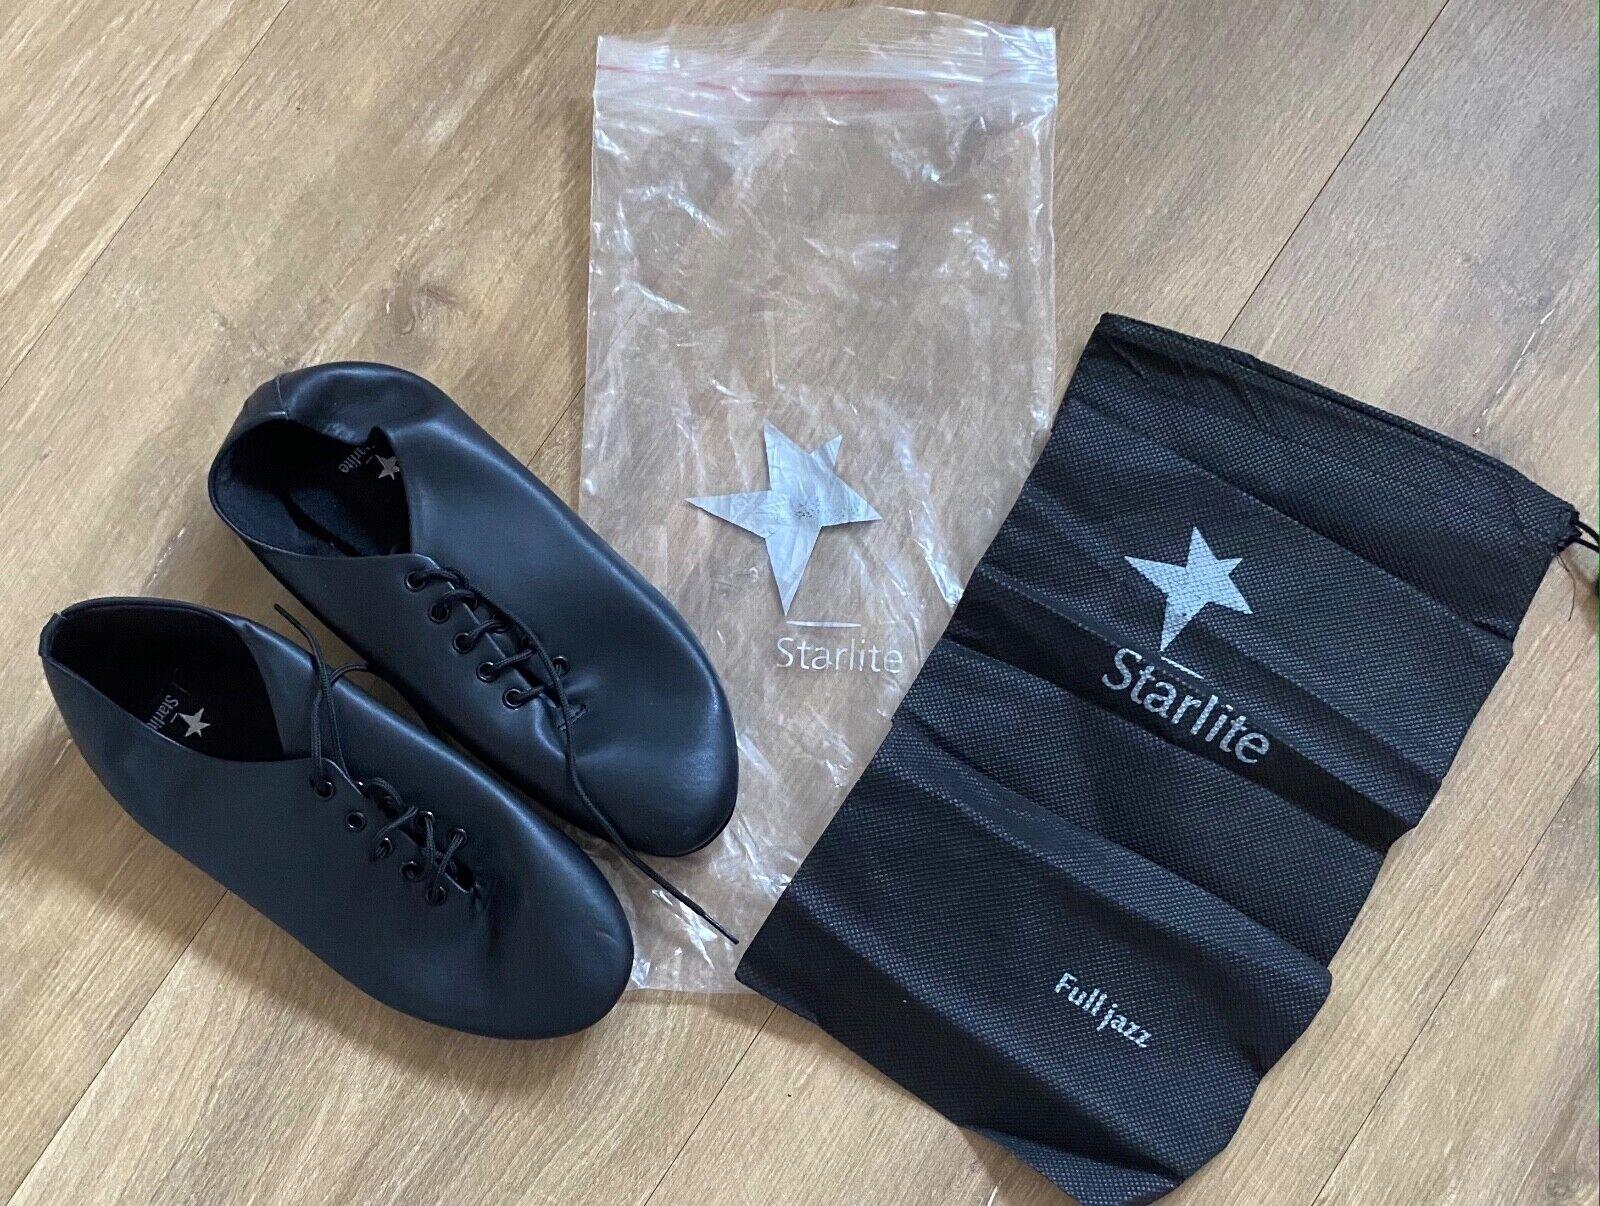 BNWT Black STARLITE Full Sole Jazz Dance Shoes & Carry Bag UK 3